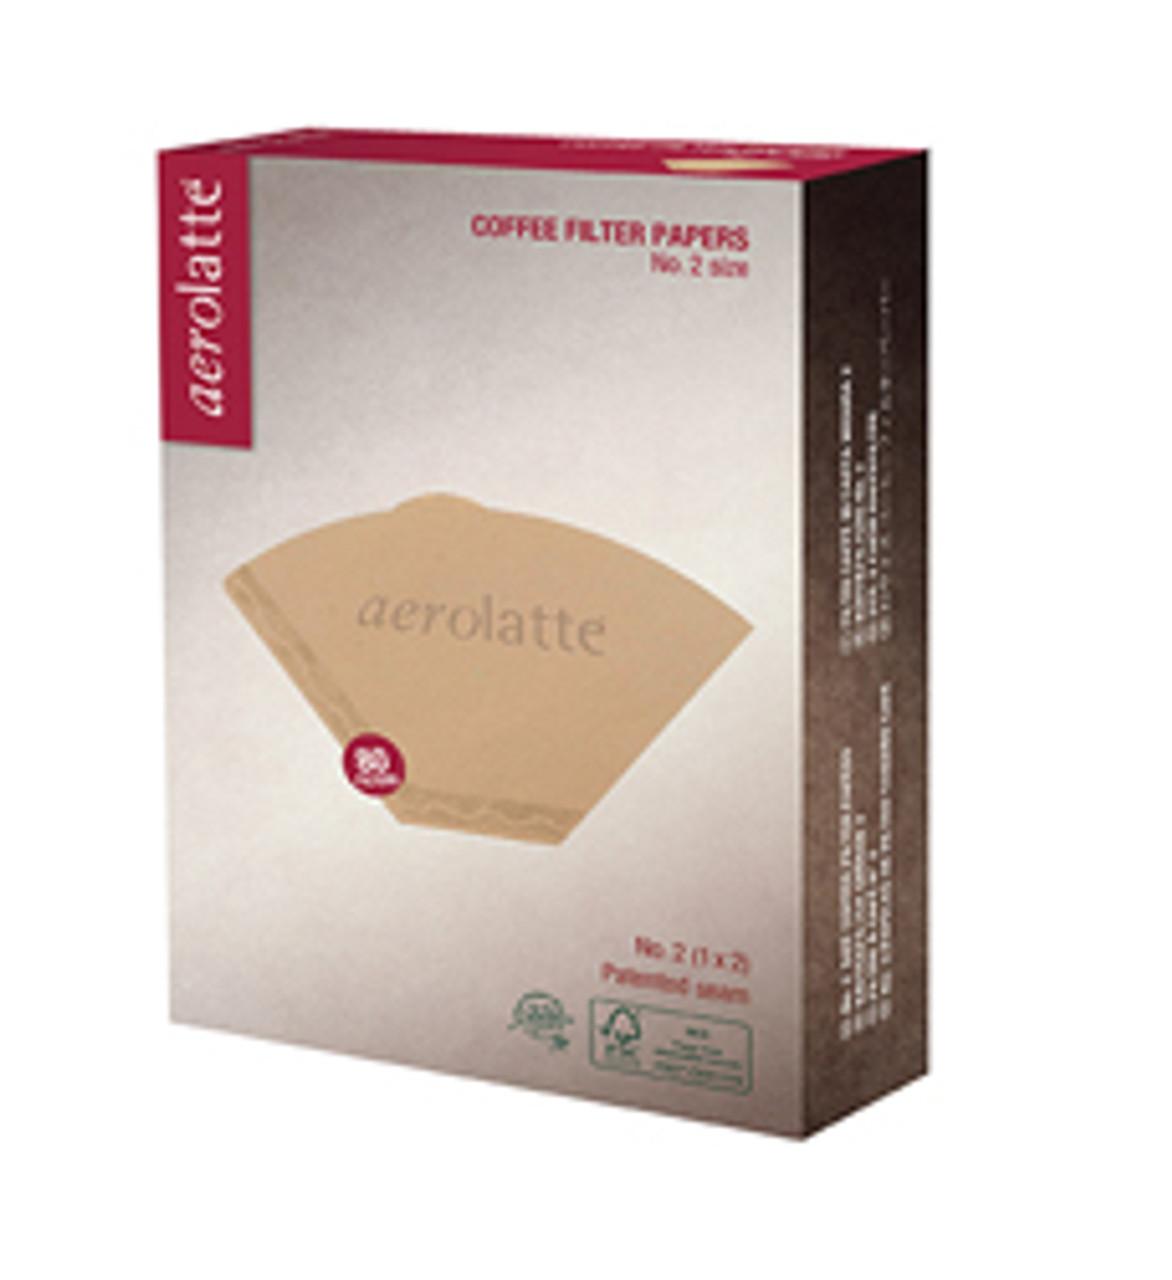 Aerolatte Unbleached Filter, 2 Cup